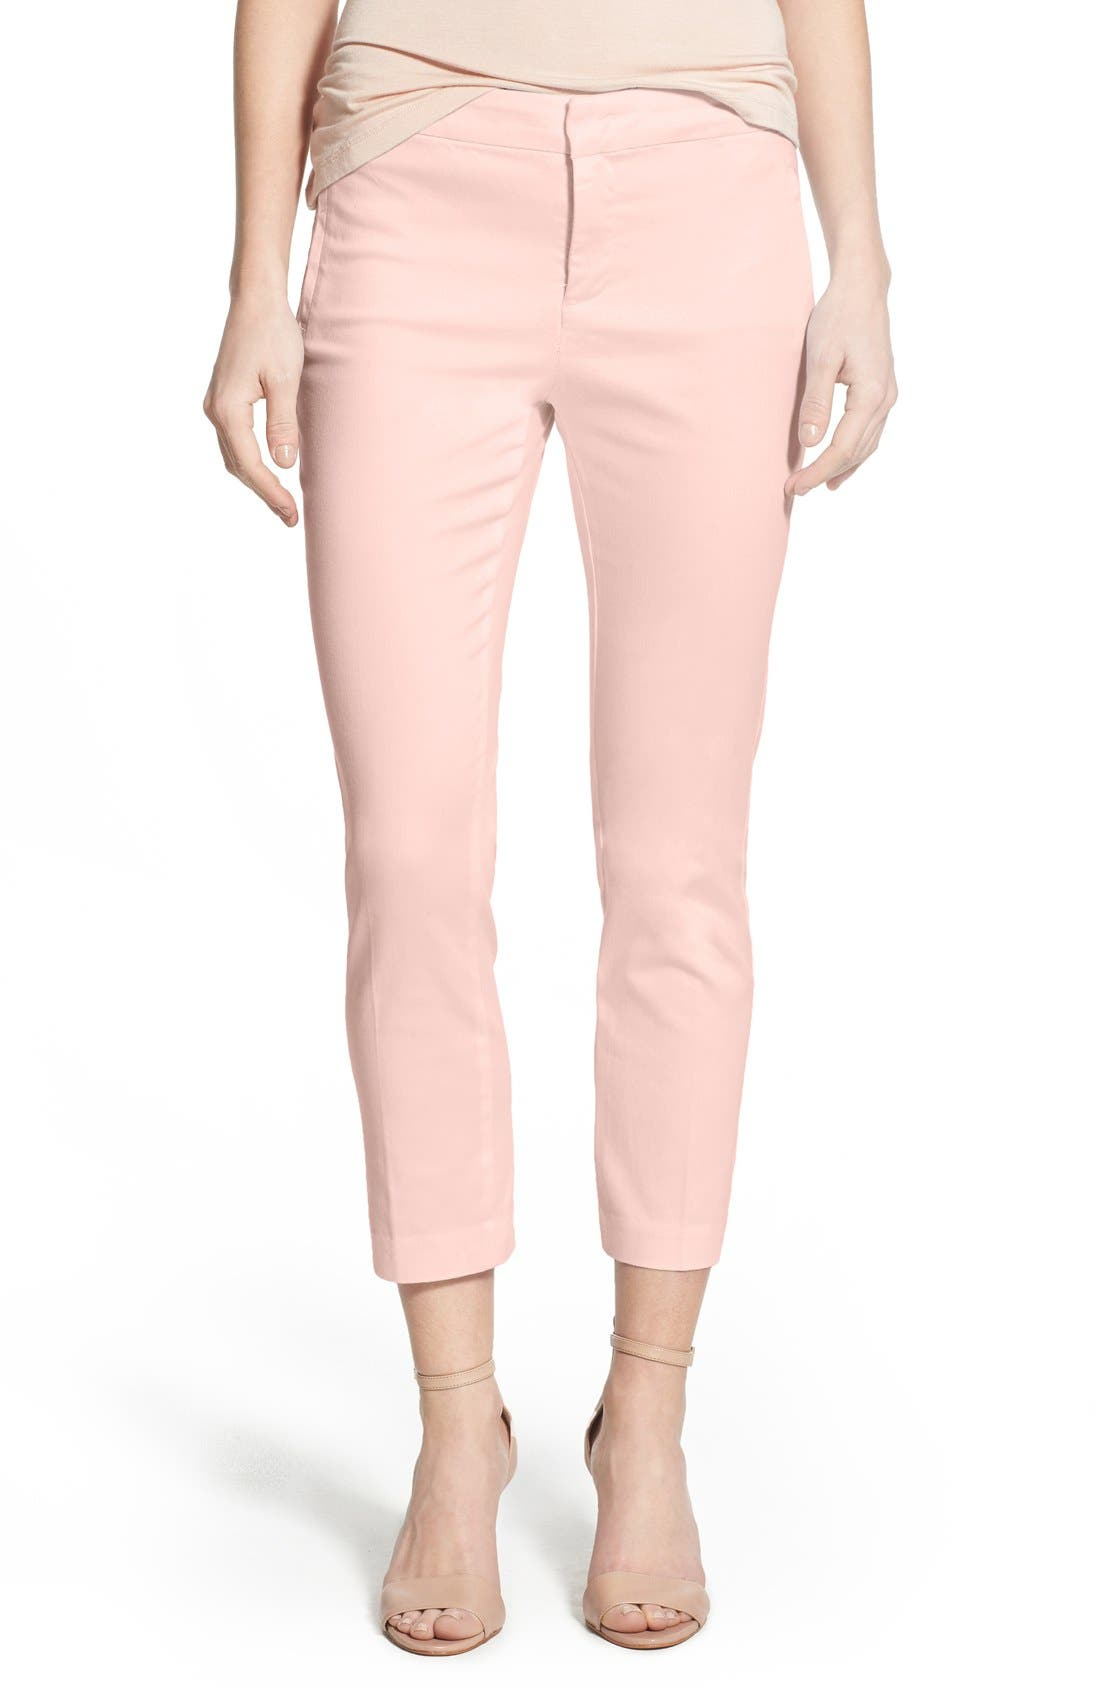 Alternate Image 1 Selected - NYDJ 'Corynna' Print Stretch Sateen Slim Ankle Pants (Regular & Petite)